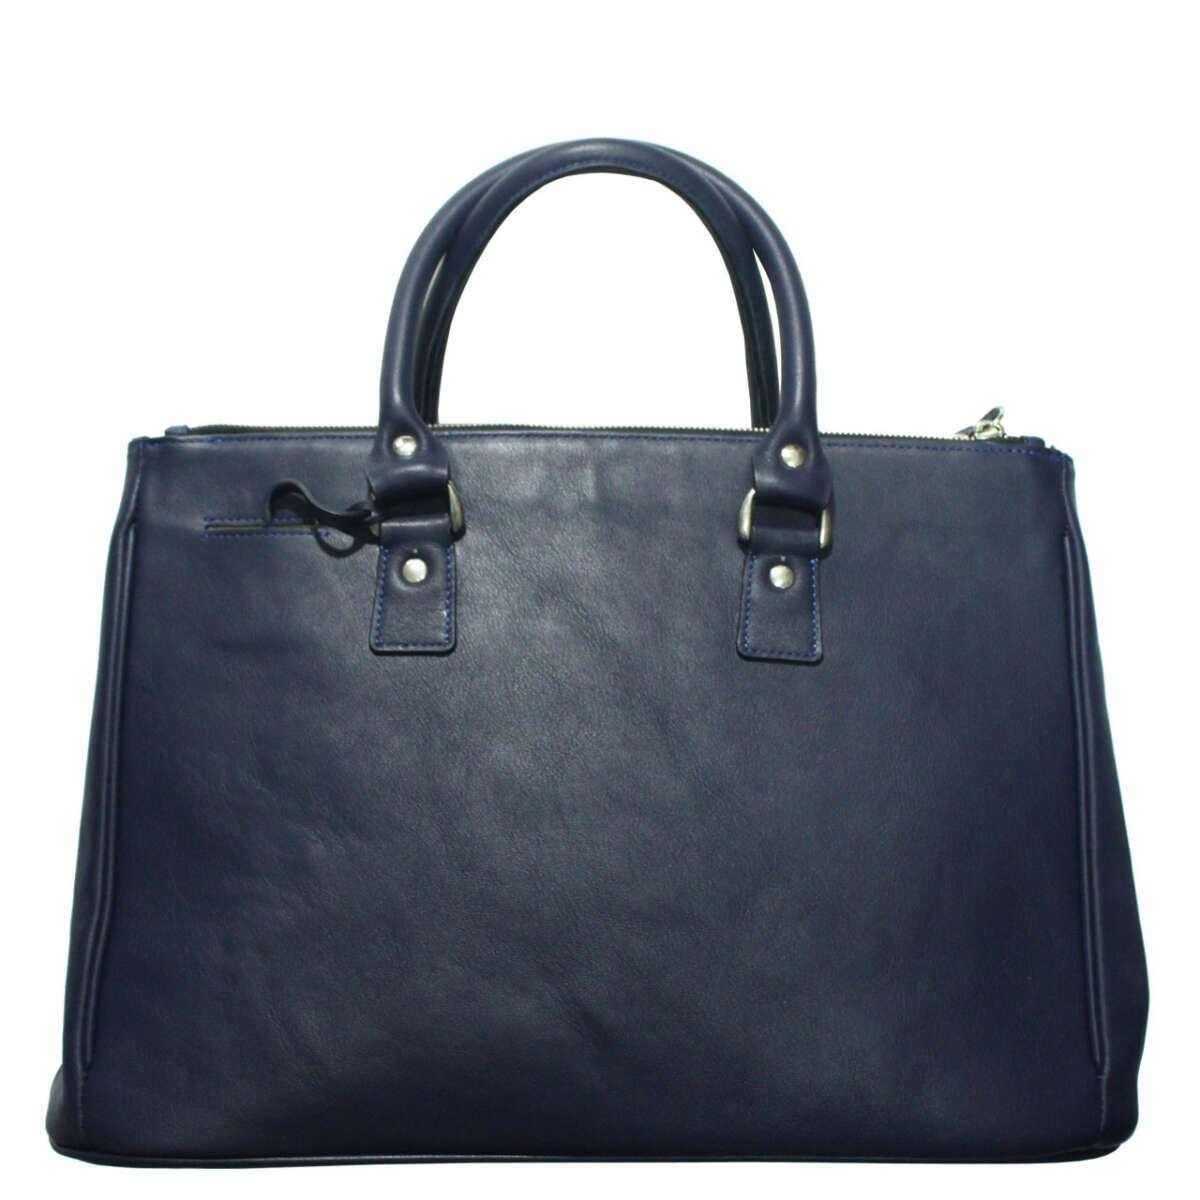 Túi xách nữ da bò B012b